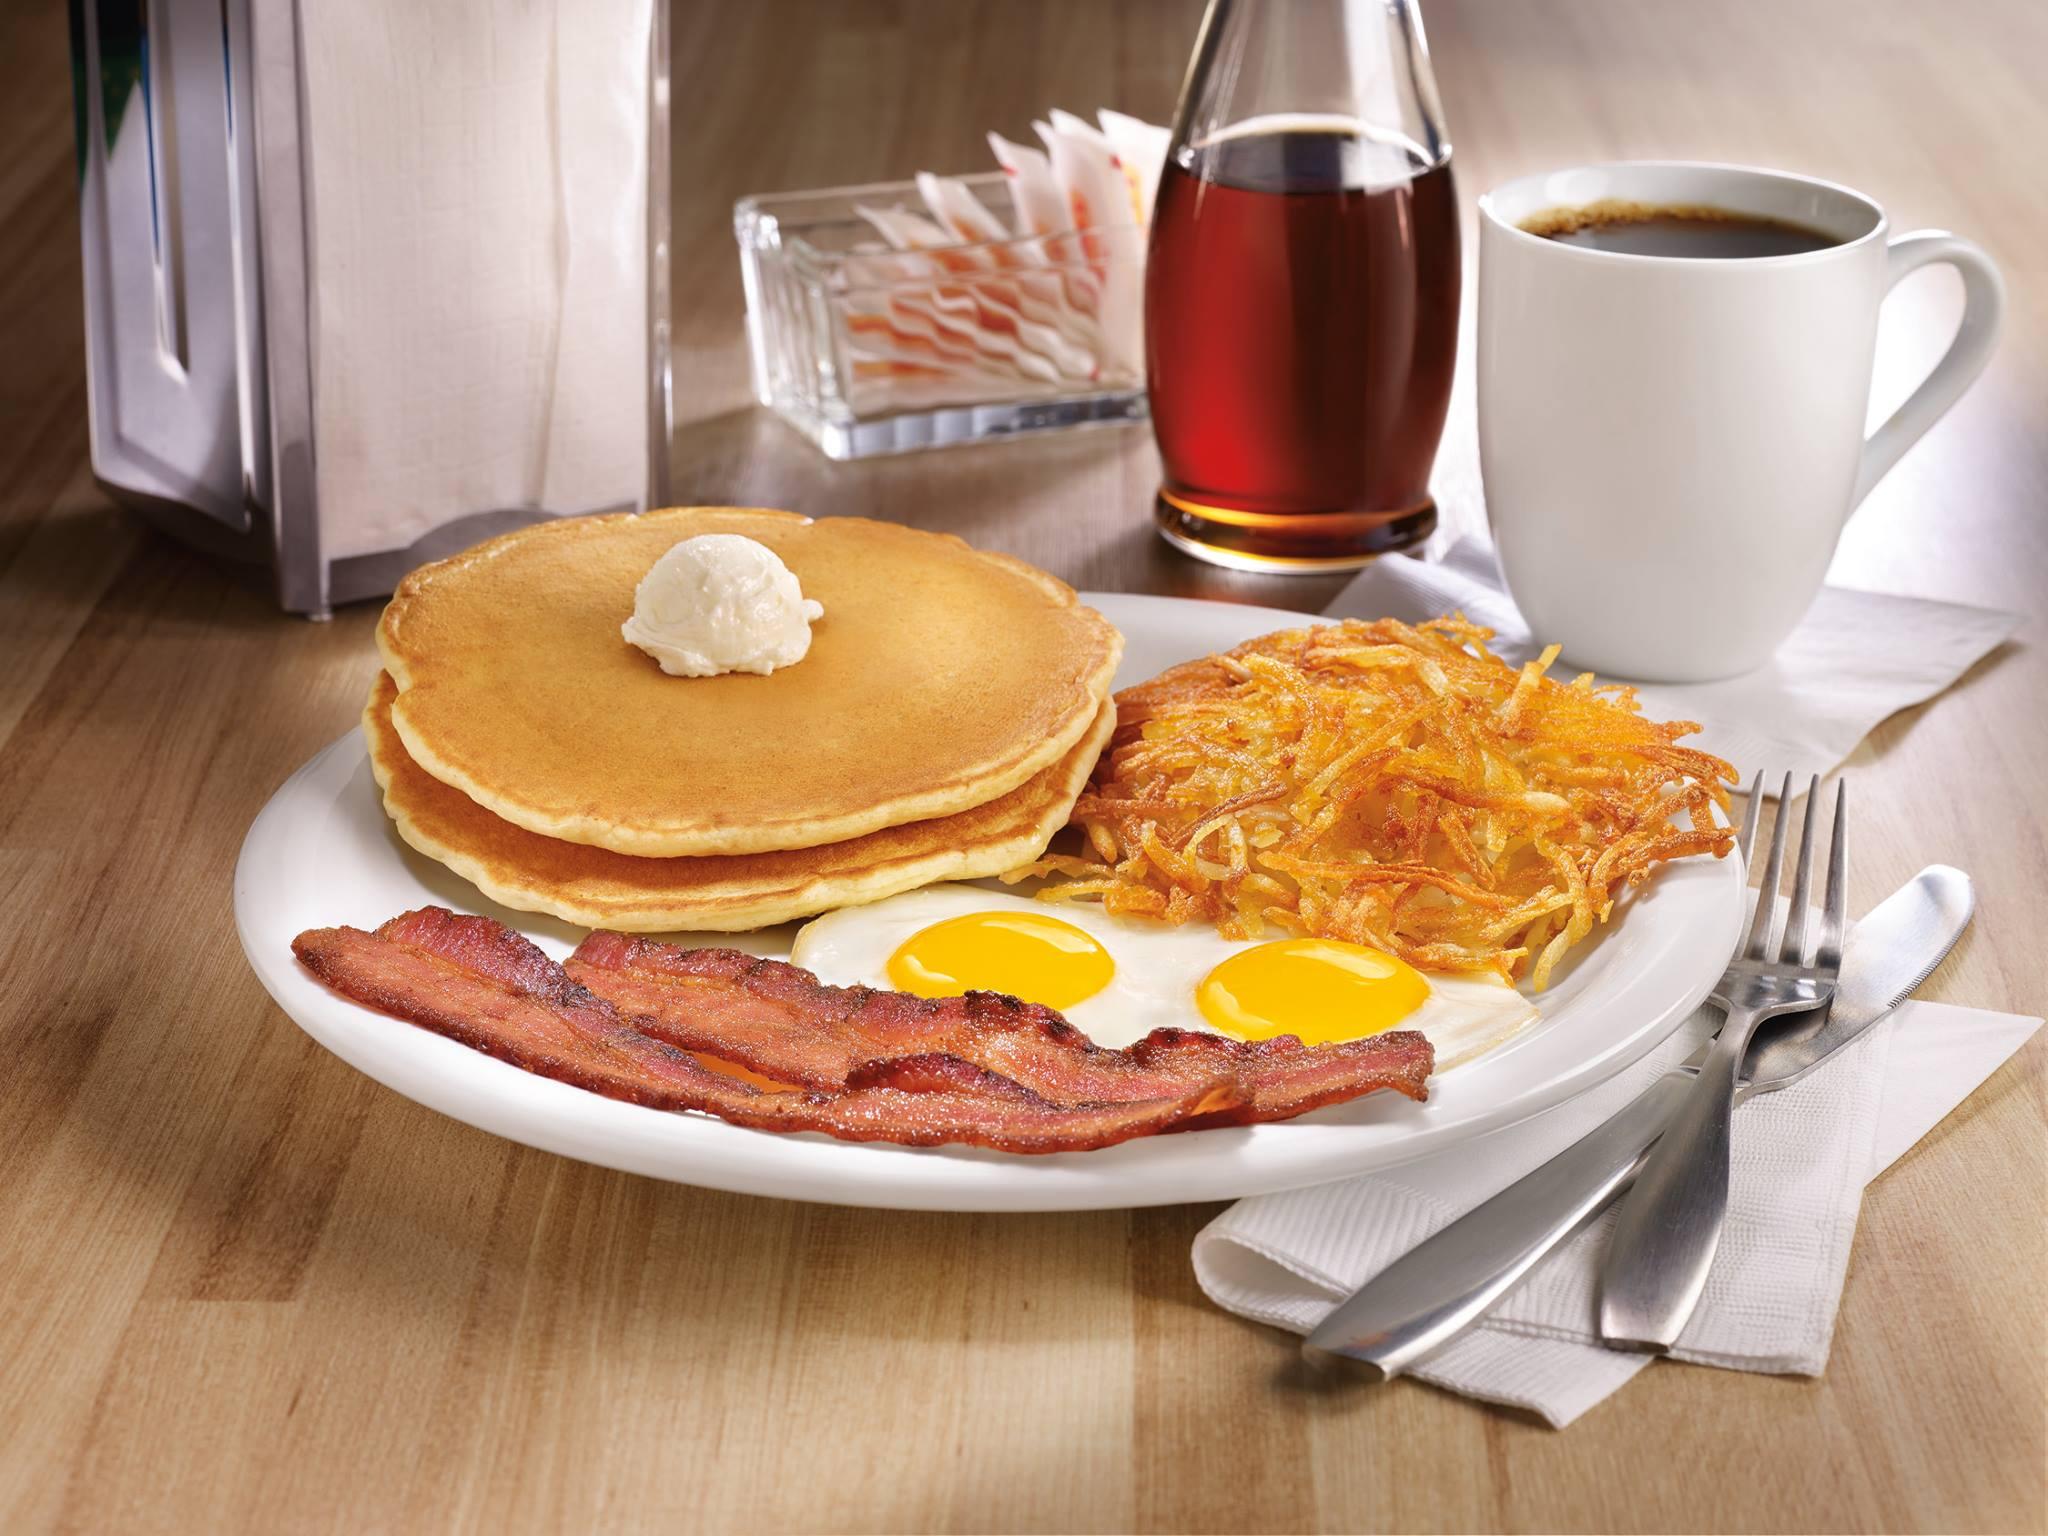 Danny's grand slam breakfast